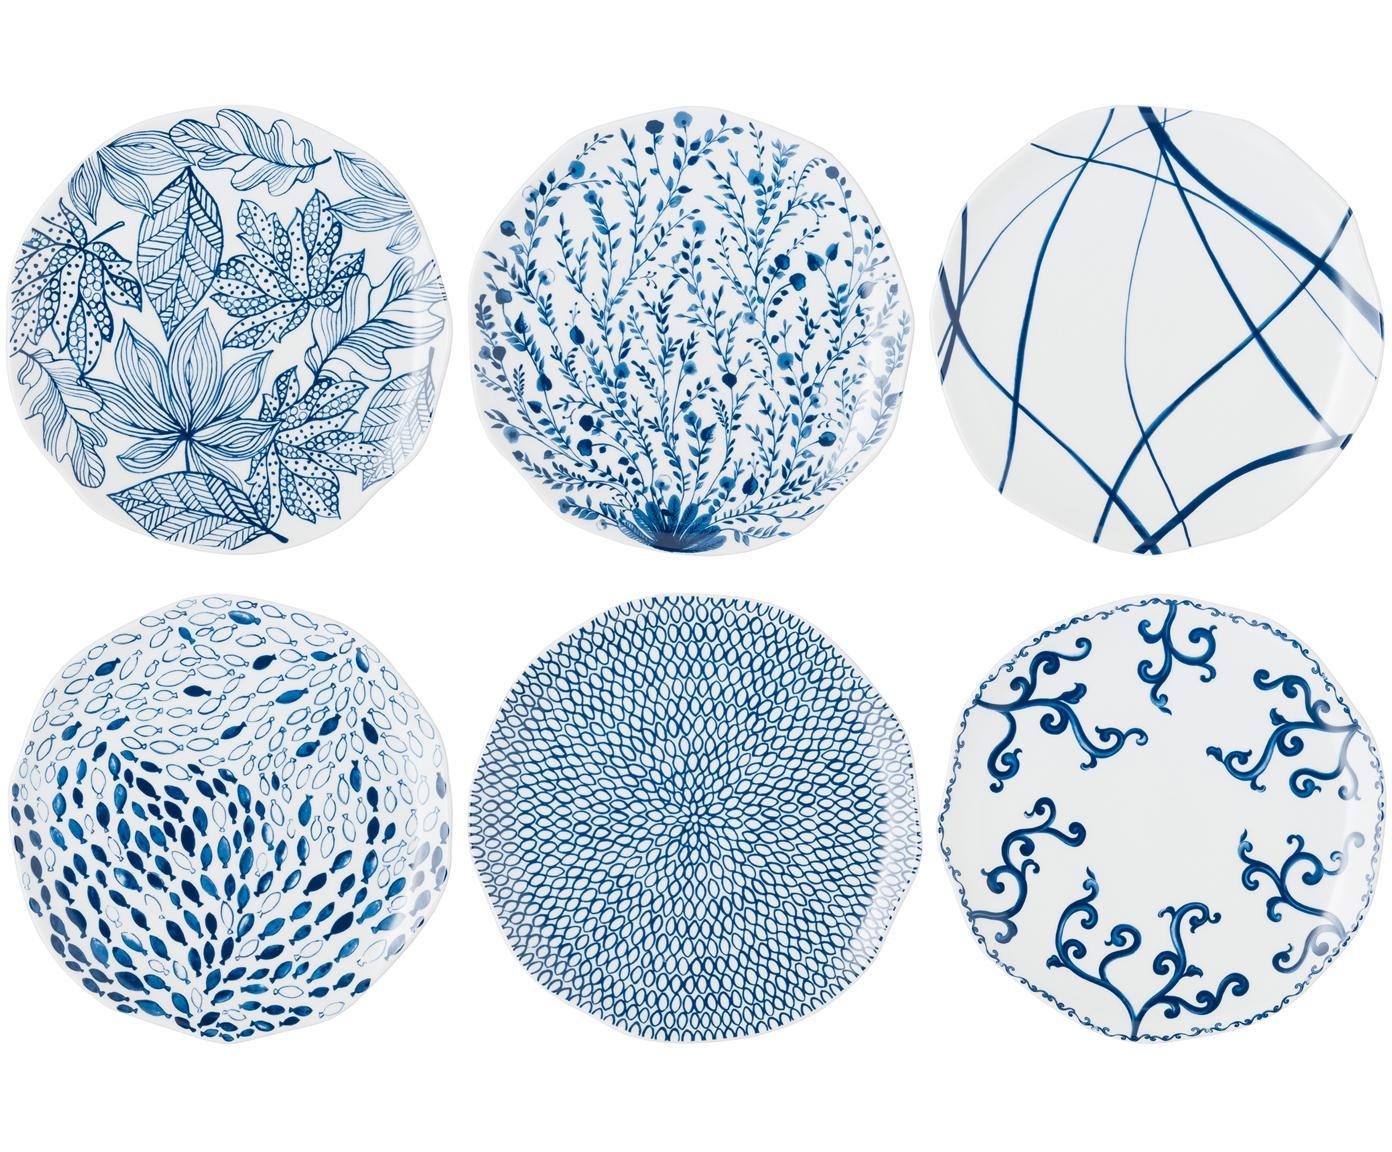 Speiseteller-Set Vassoio, 6-tlg., Porzellan, Blau, Weiß, Ø 27 cm